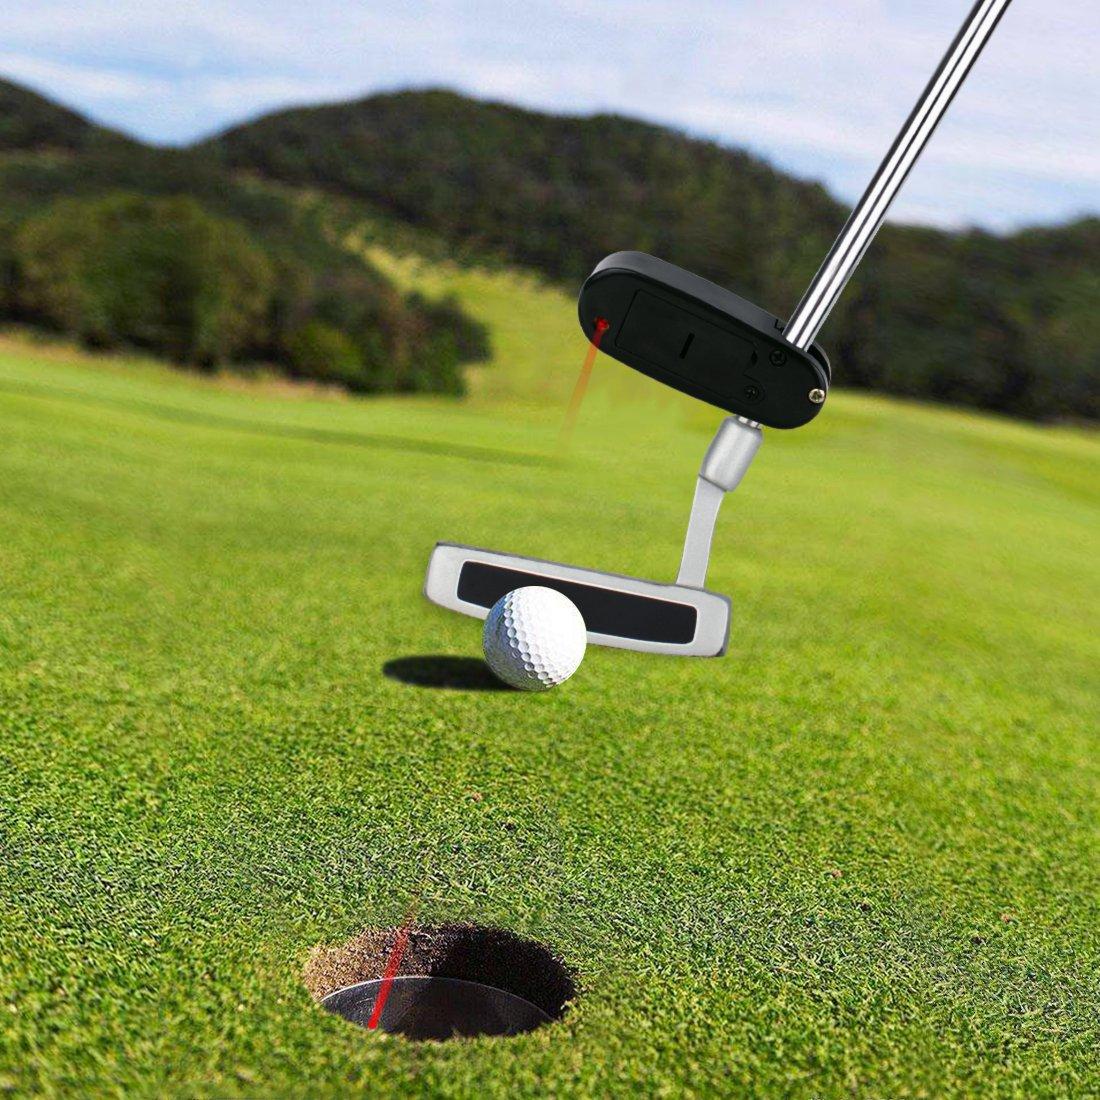 Andux Golf Laser Putting Trainers Golf Training Aids GEFTG-01